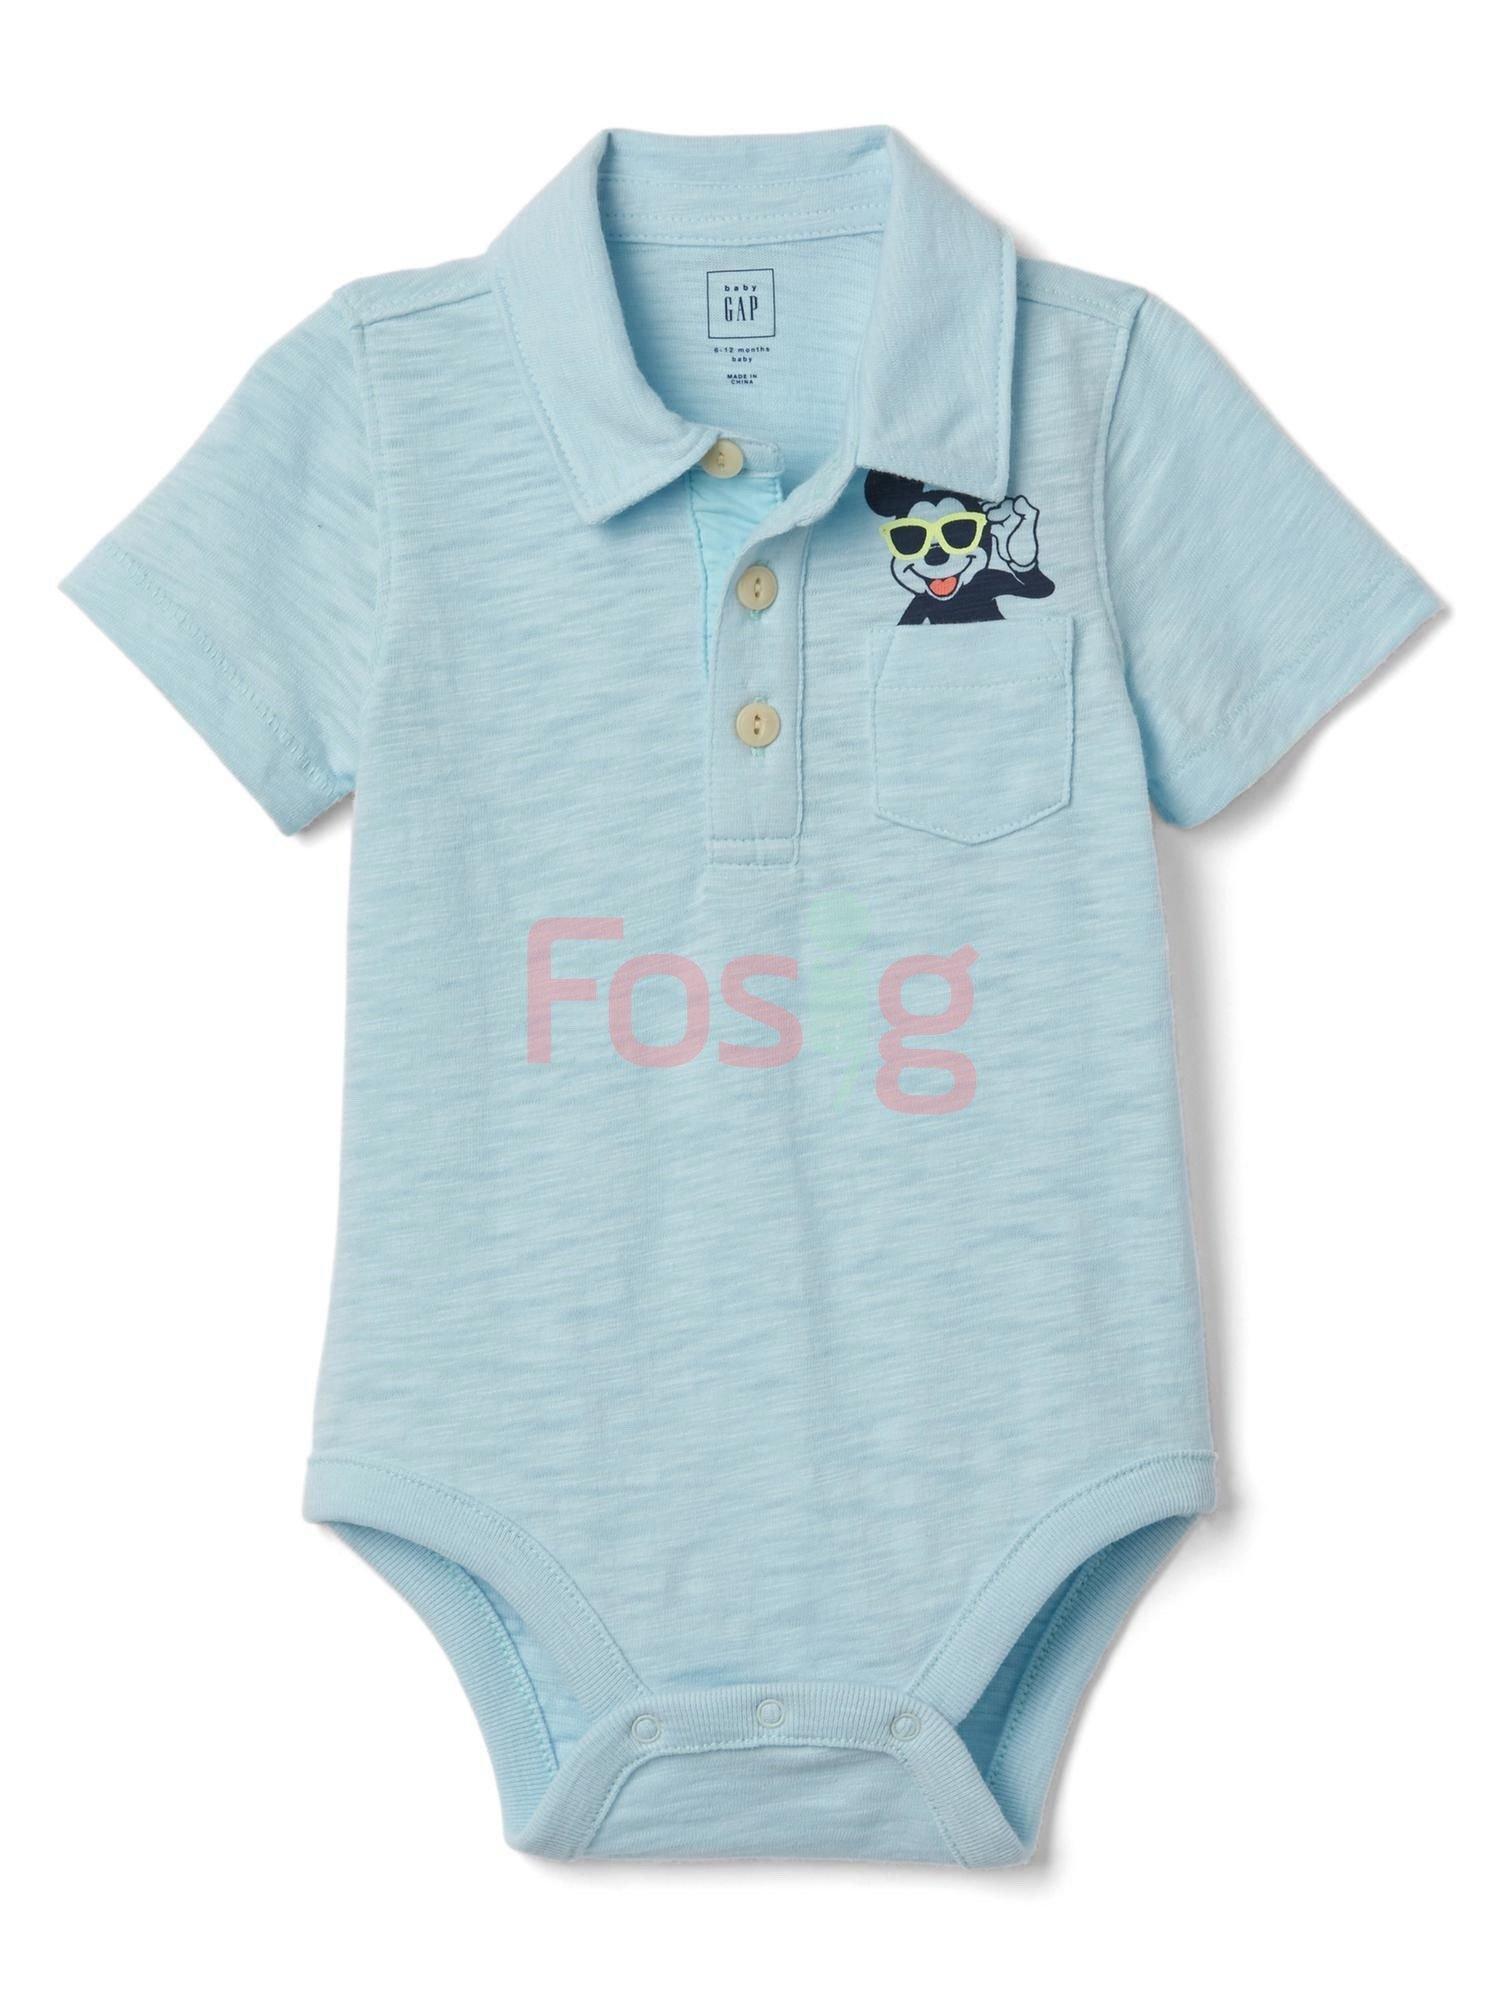 [13-14kg] Bodysuit Baby Gap 81 [Boy] - Xanh Trời/Mickey